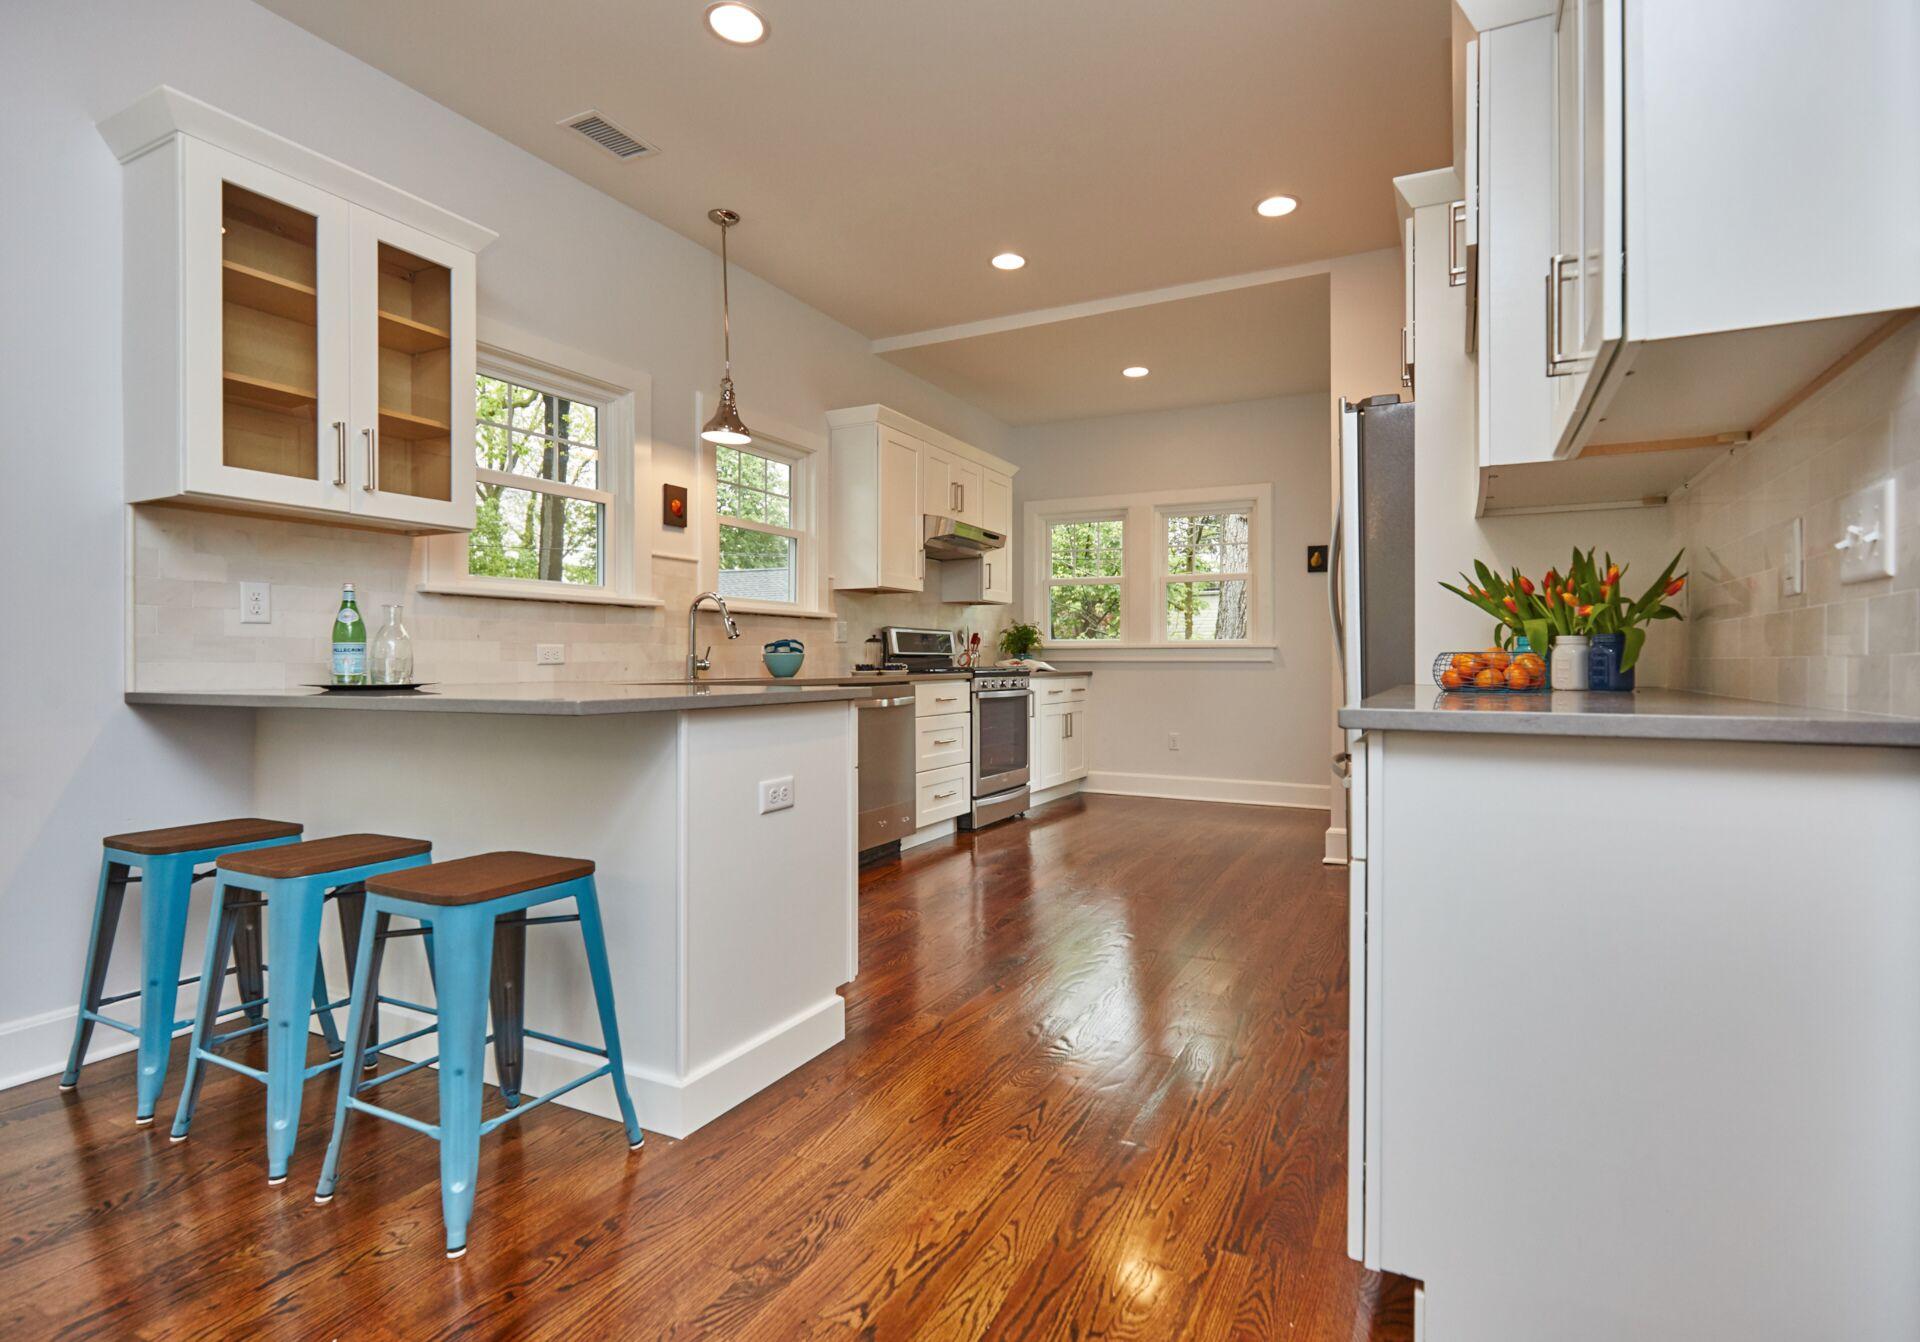 5 Incredible Kitchen